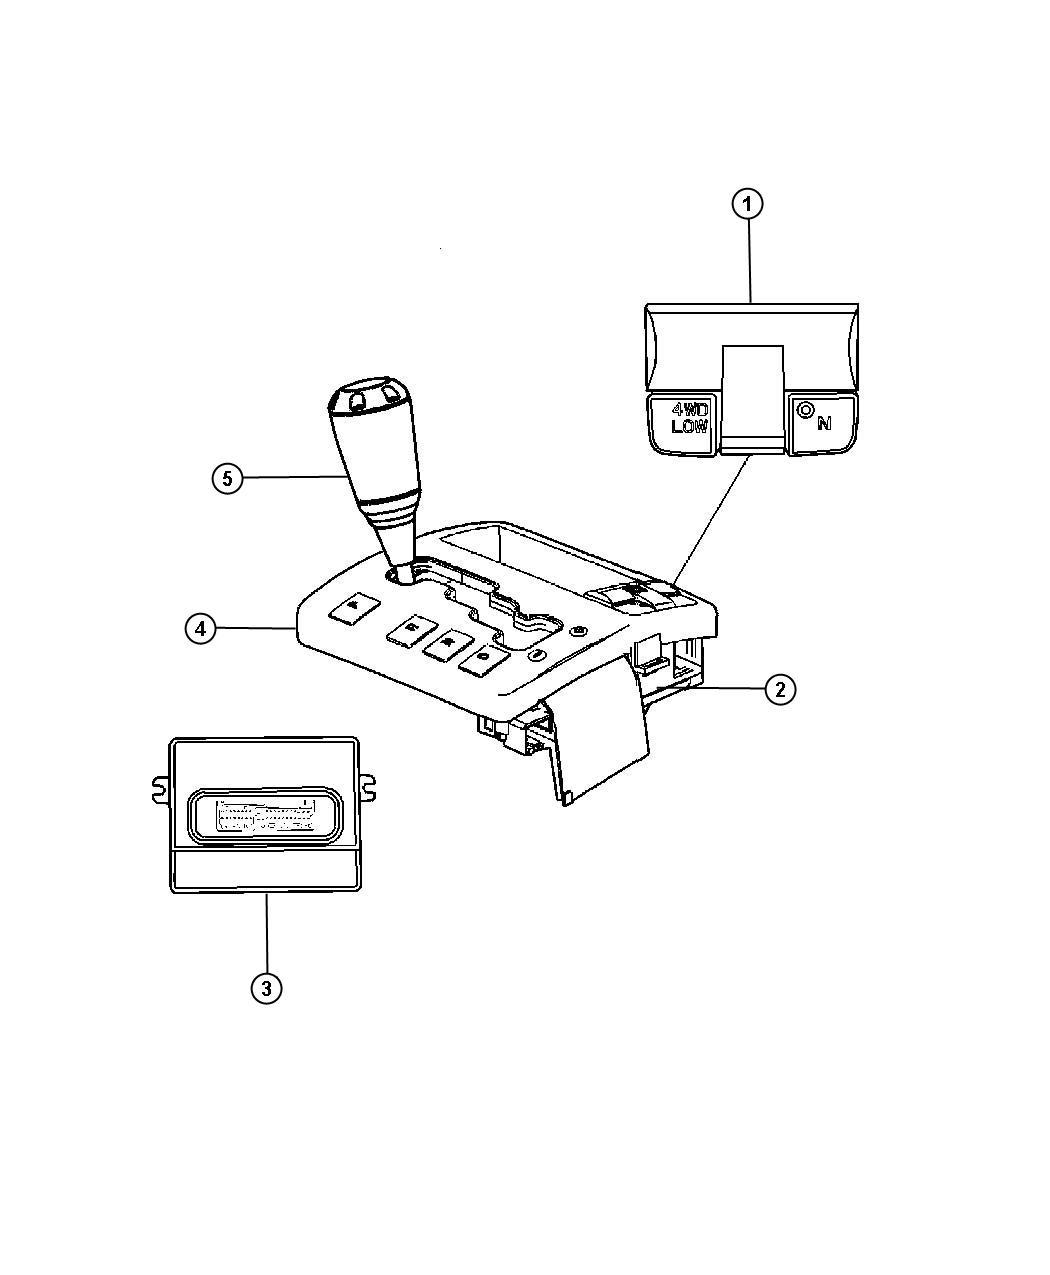 tags: #jeep cj5 dimensions#jeep cj5 exhaust system#jeep cj5 hardware#jeep  cj5 soft top frame#jeep cj5 ignition coil schematic#jeep cj5 brake diagrams# jeep